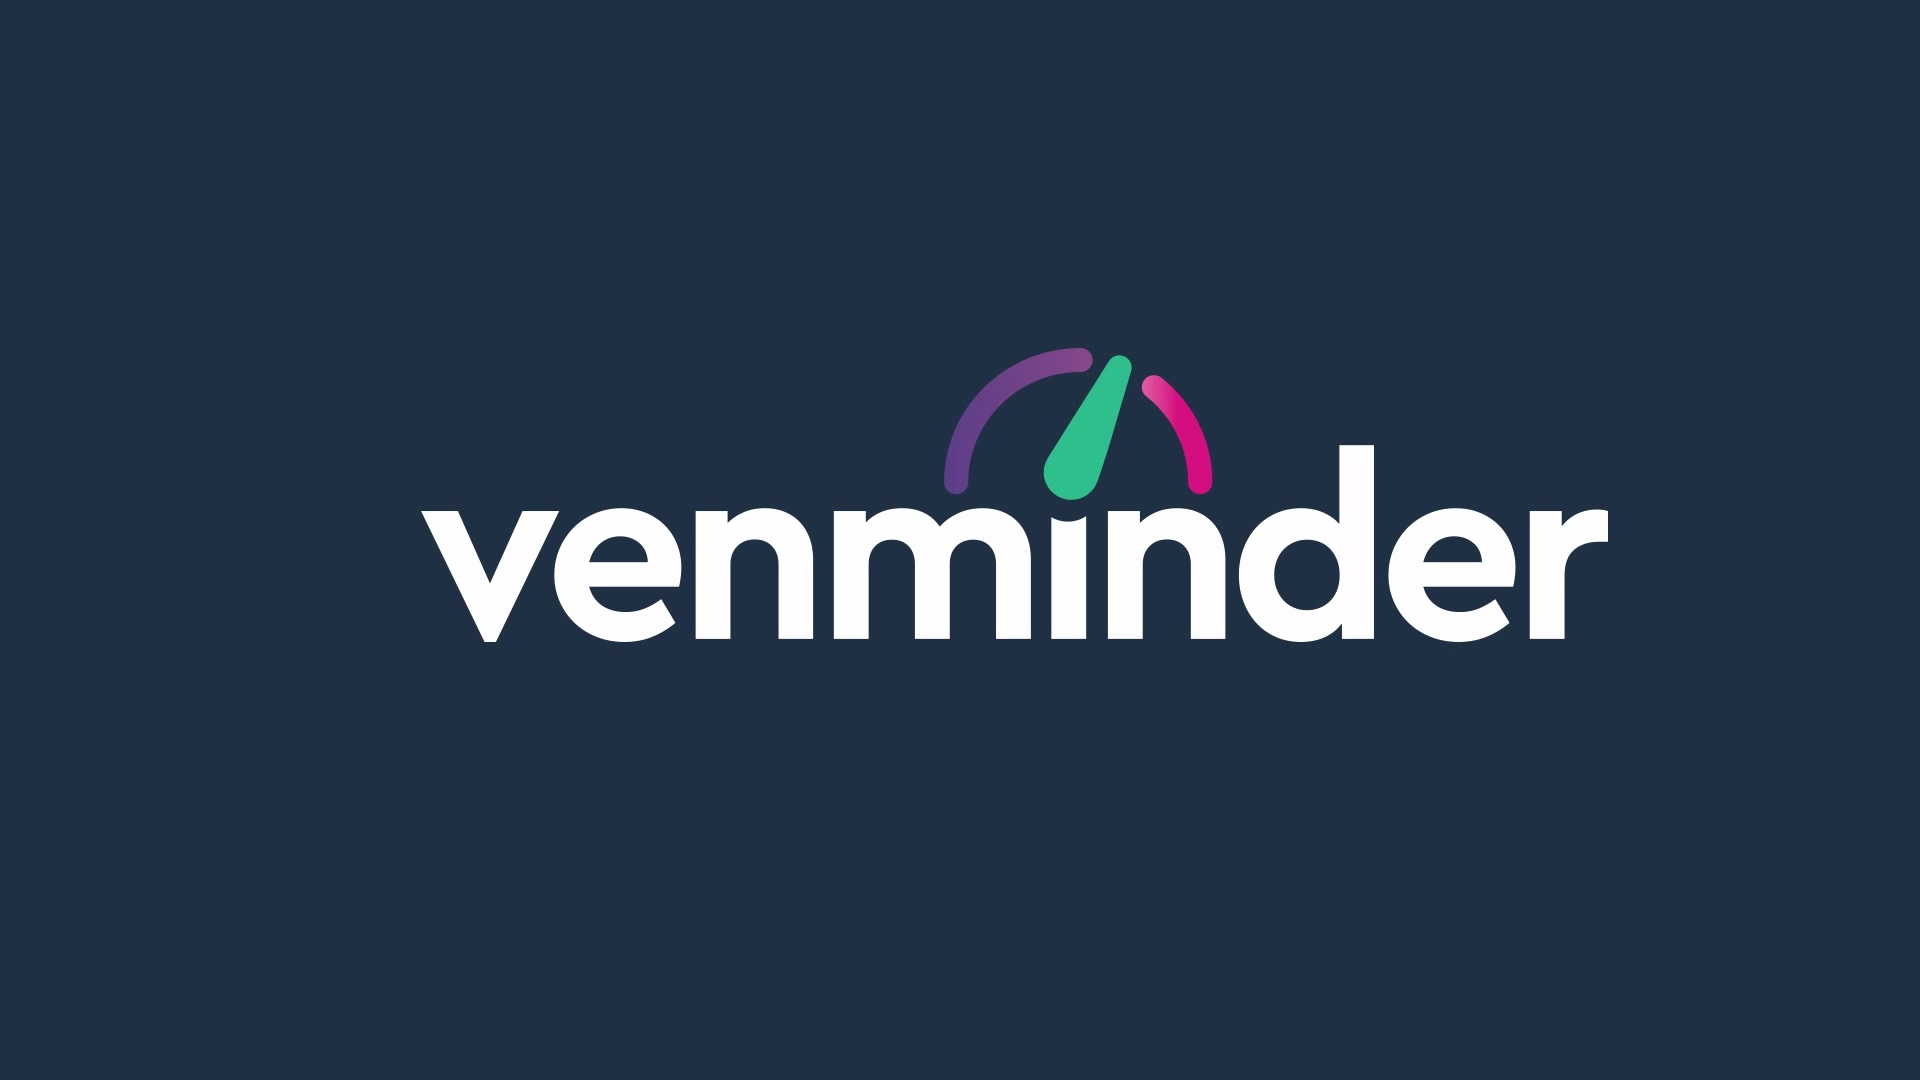 The New Venminder Logo